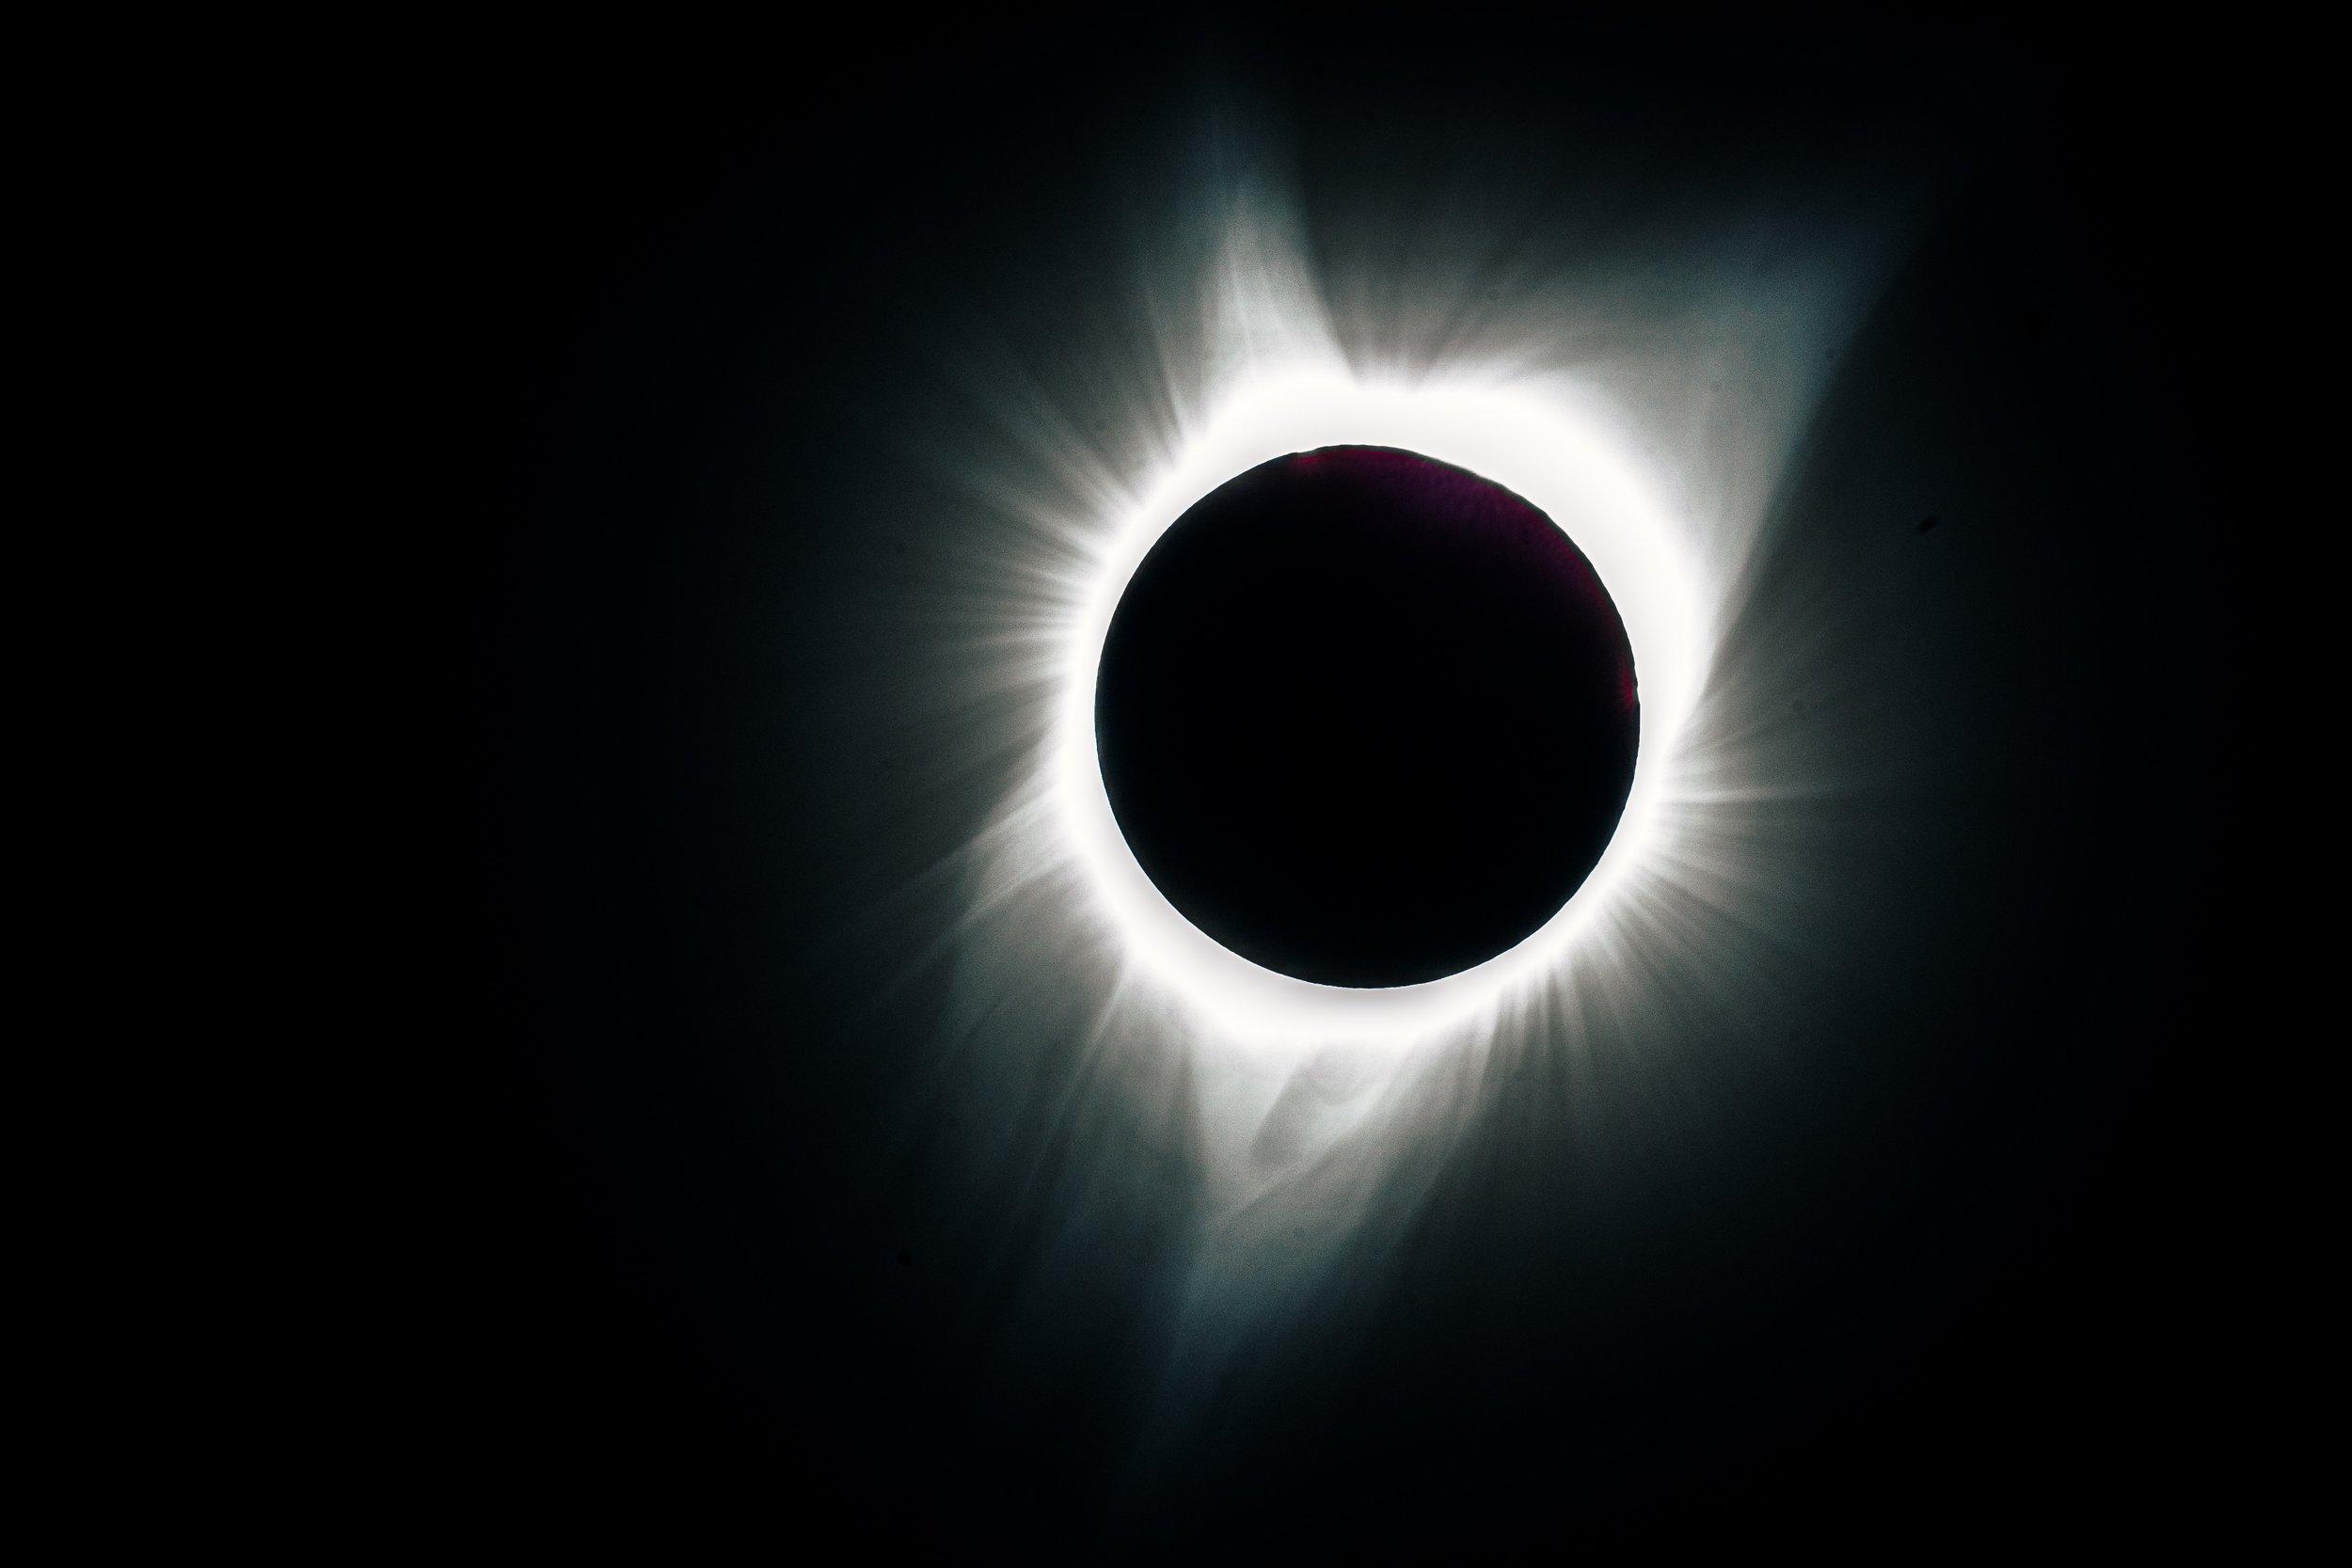 KimCarroll.com- Eclipse-3-min.jpg